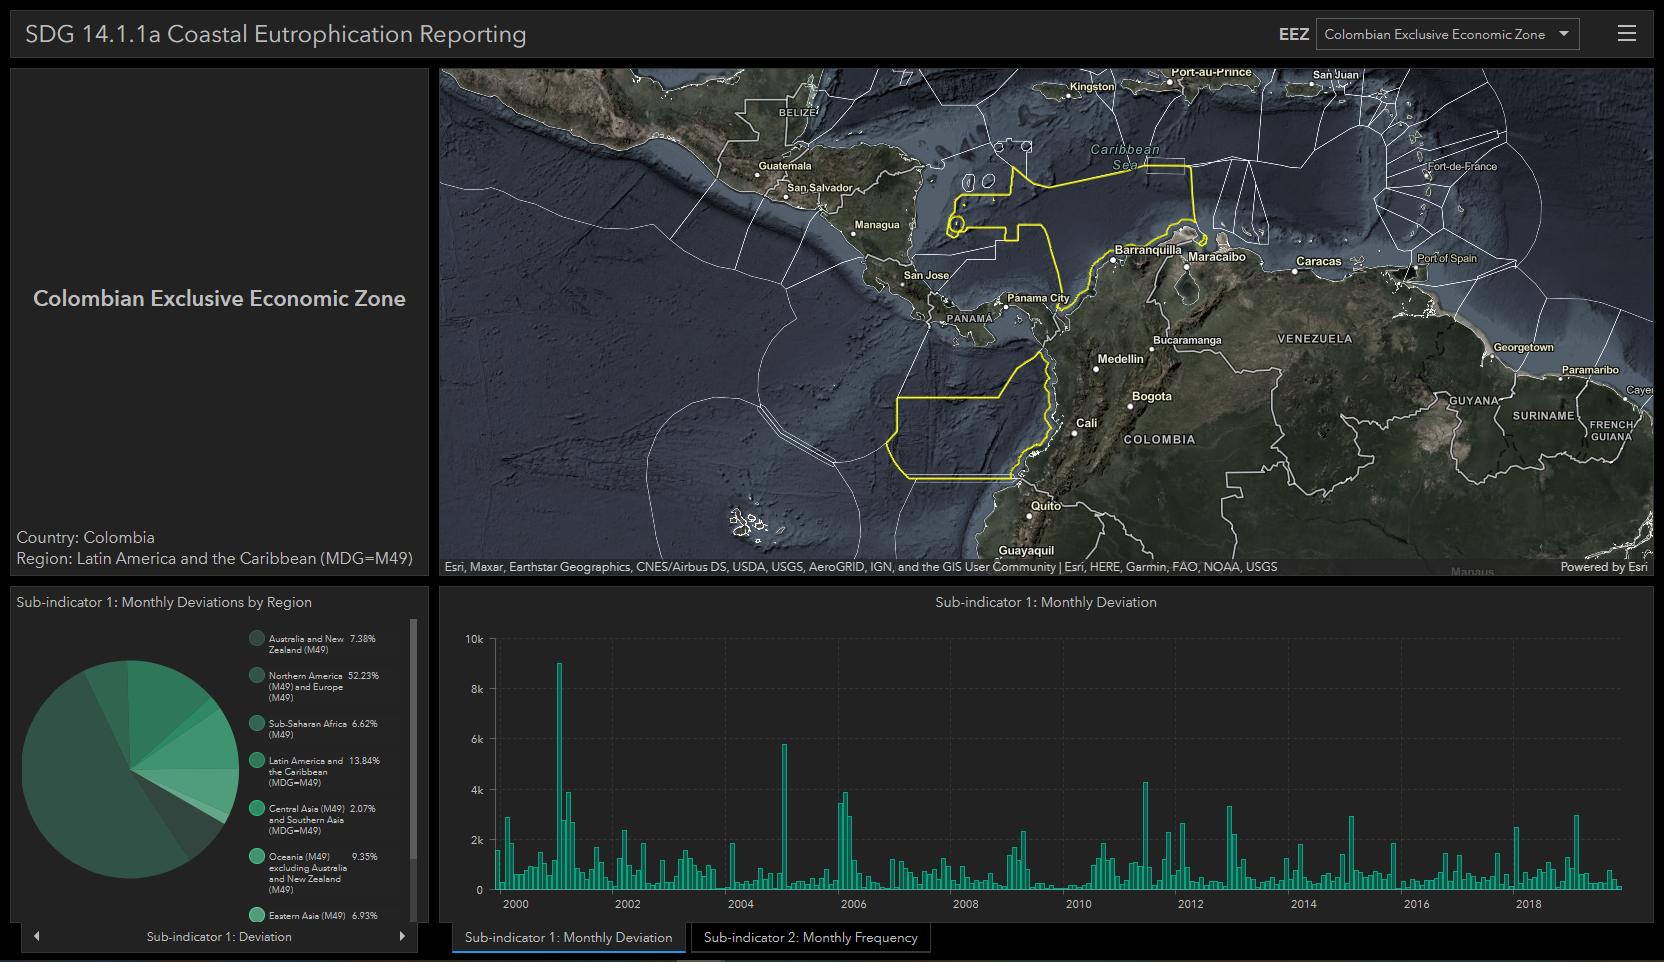 Coastal Eutrophication Reporting Dashboard